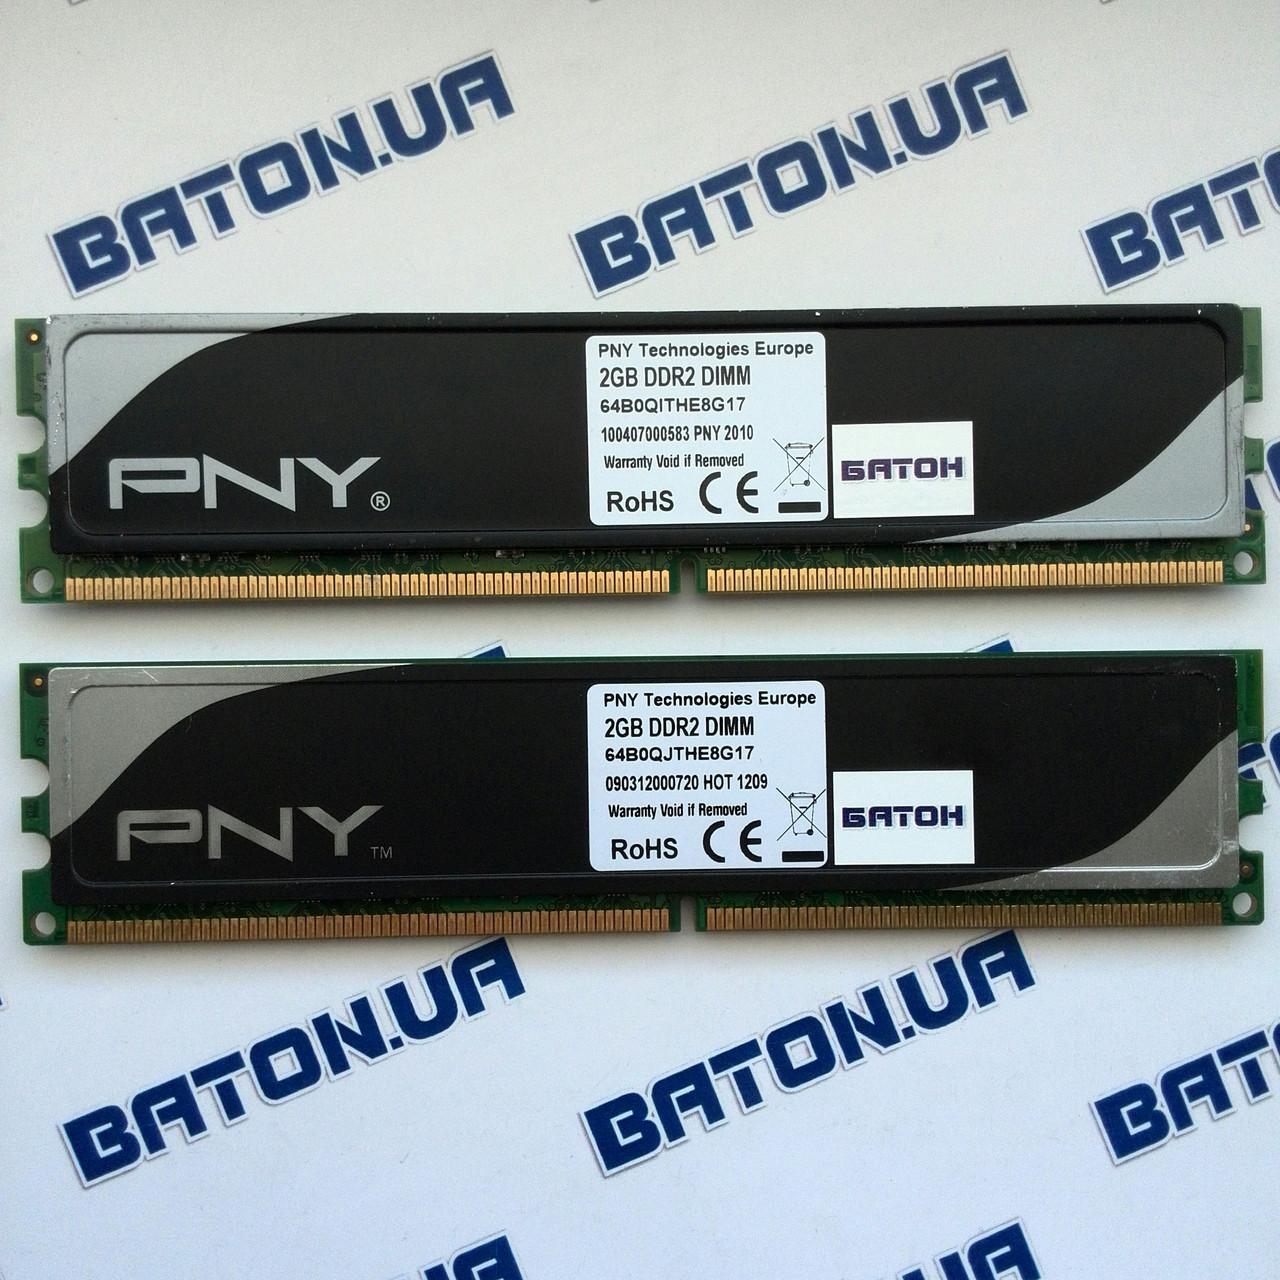 Игровая оперативная память PNY DDR2 2Gb+2Gb 800MHz PC2 6400U CL6 (64B0QJTHE8G17)